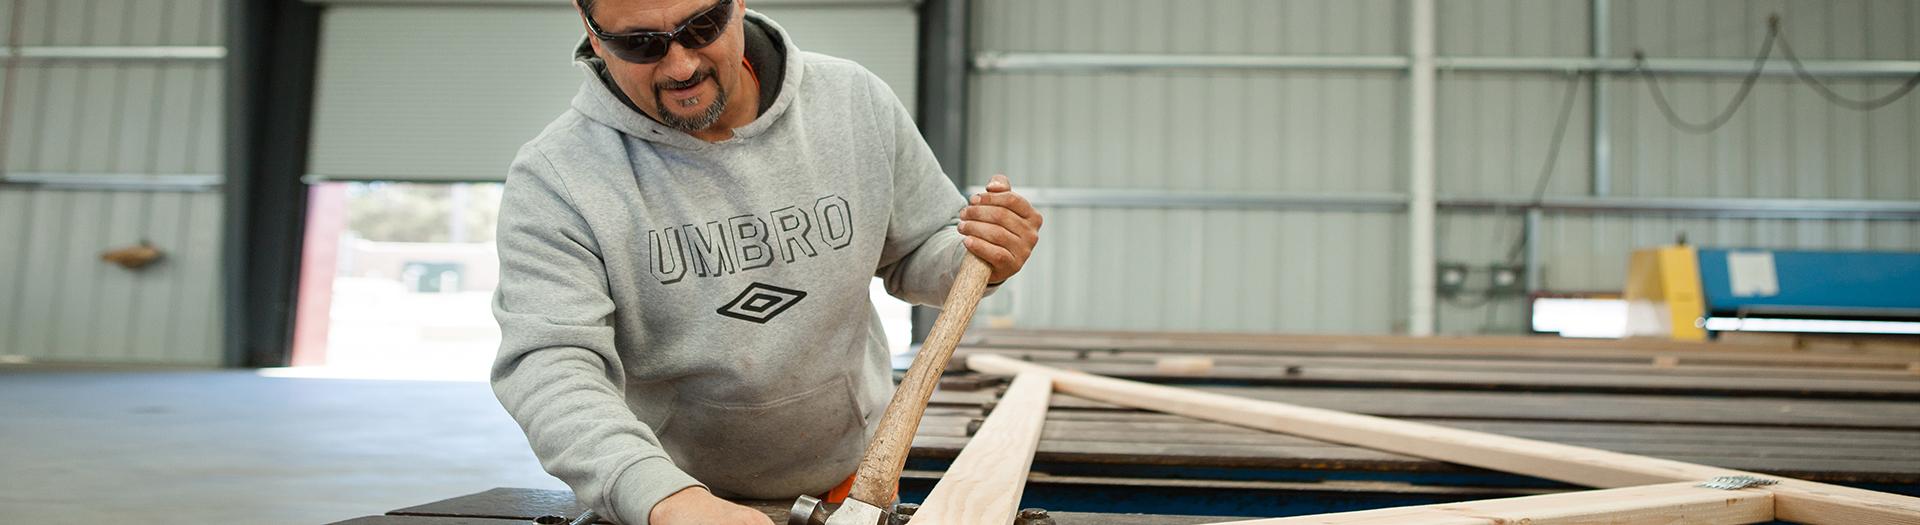 Assembling precision cut roof trusses